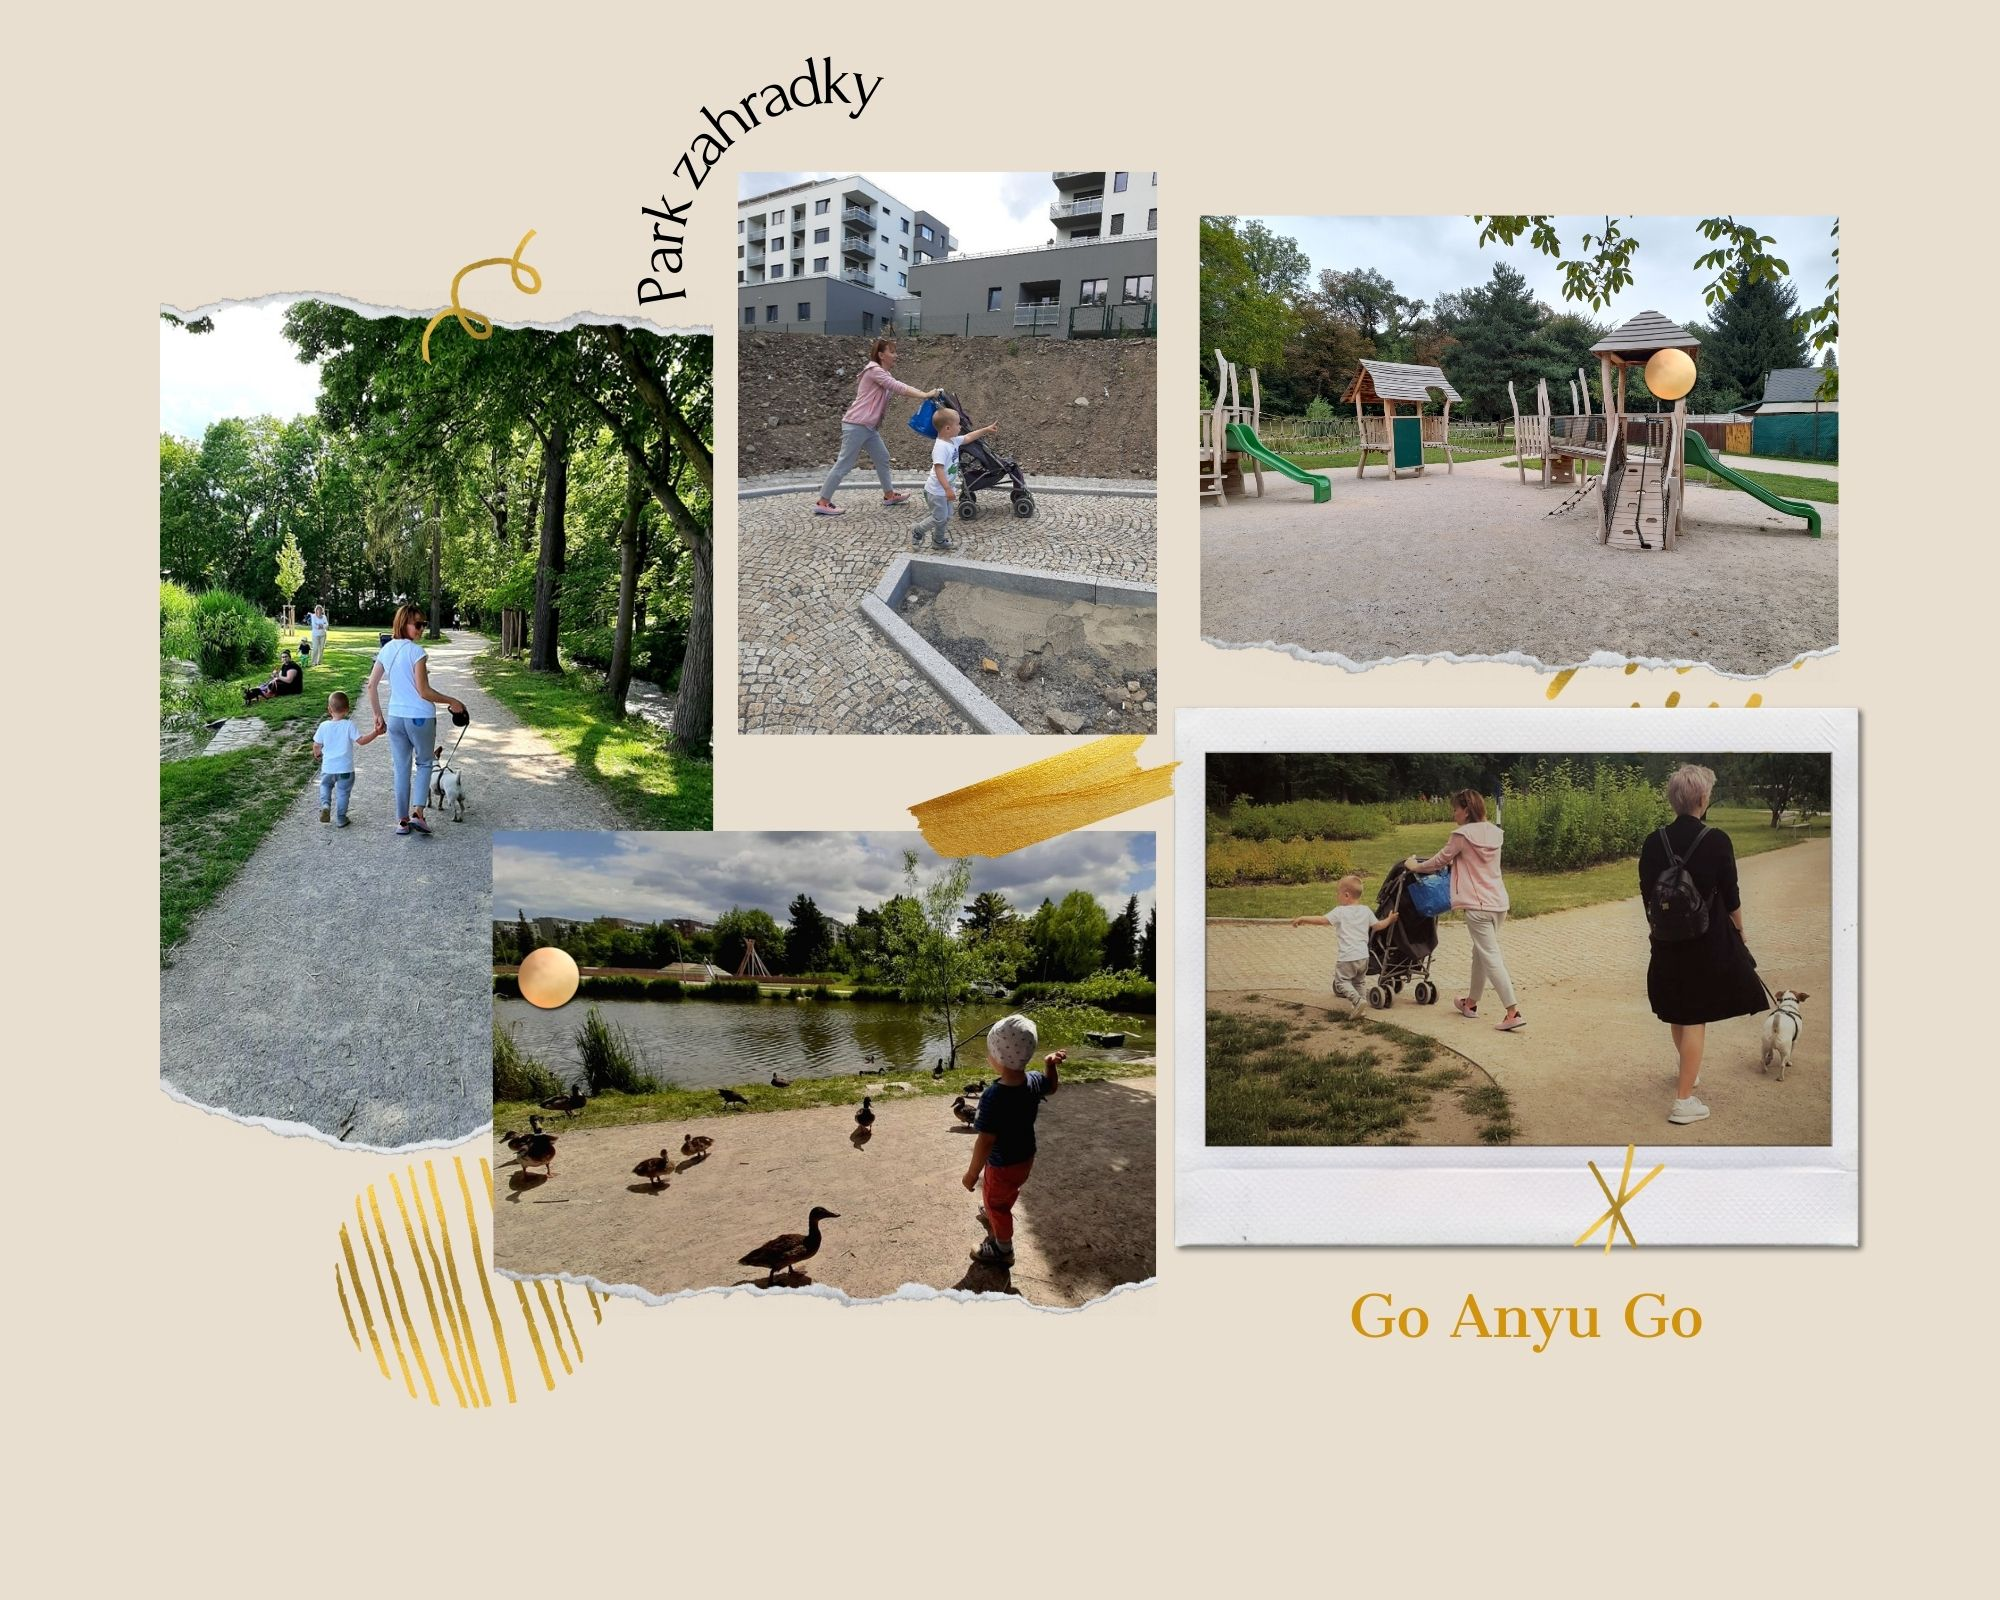 park_zahradky_kollazs_goanyugo_elmenybarat_otletblog_2.jpg